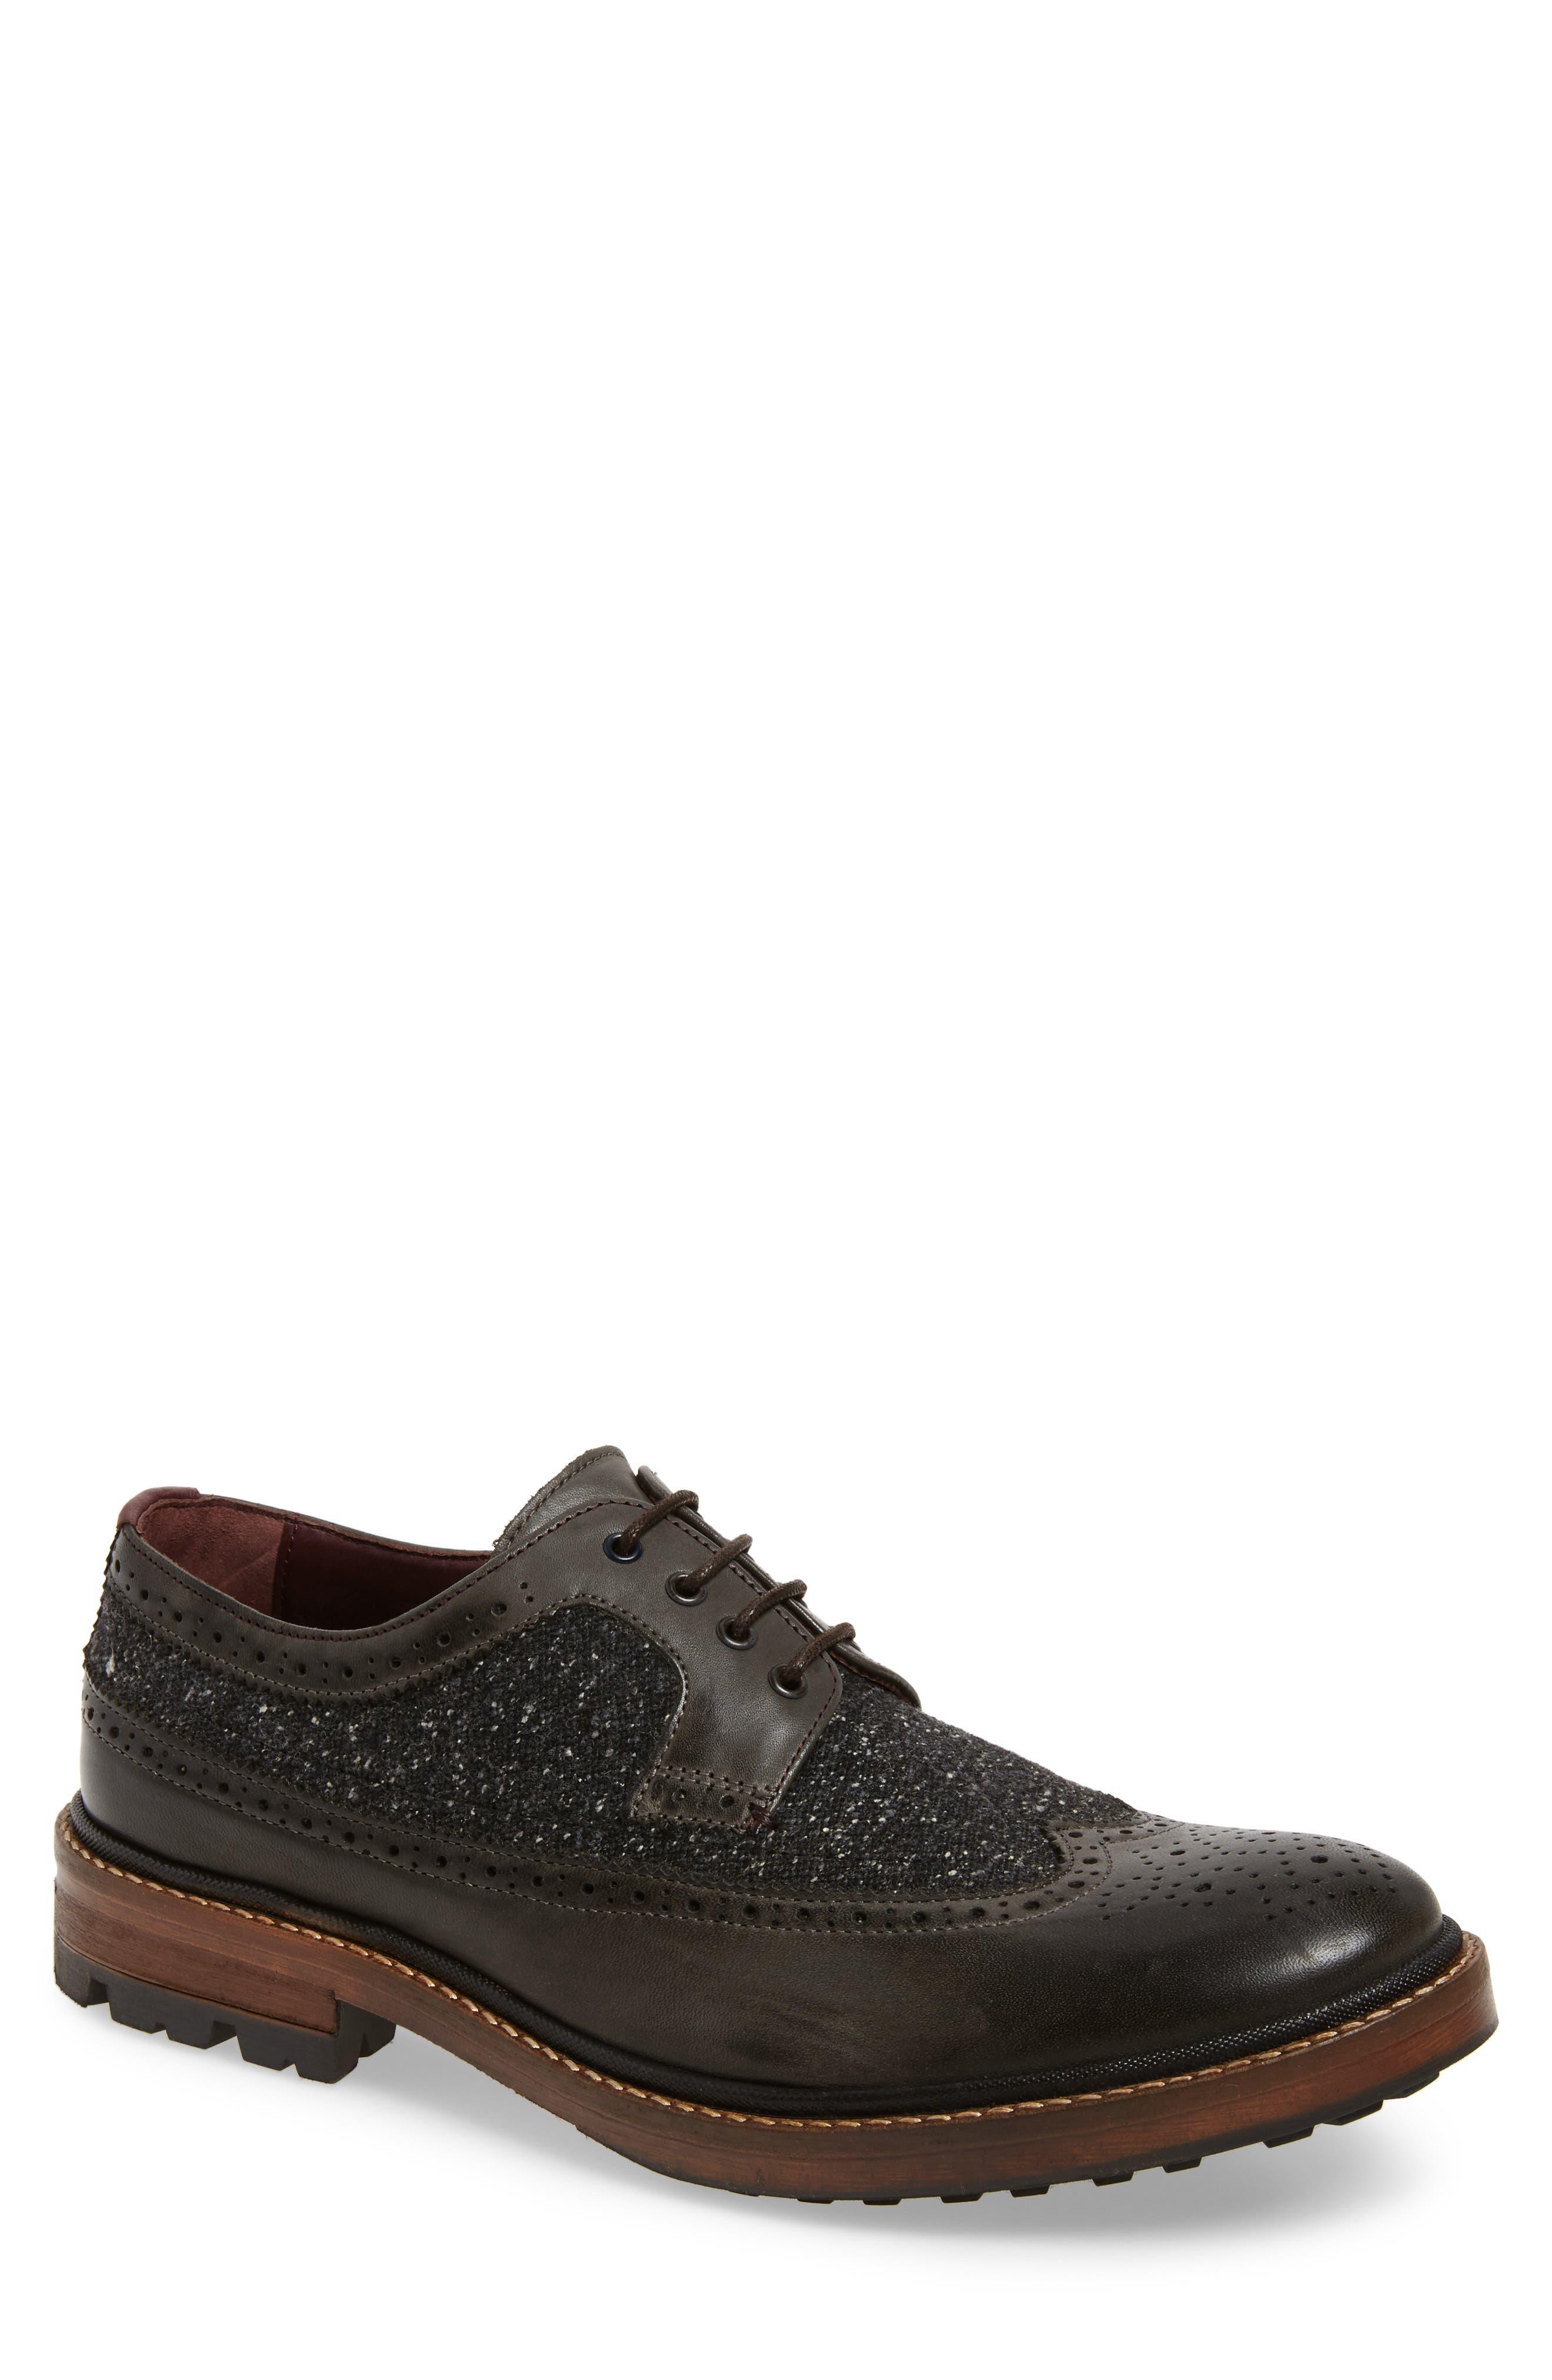 Casbo Spectator Shoe,                         Main,                         color, 080